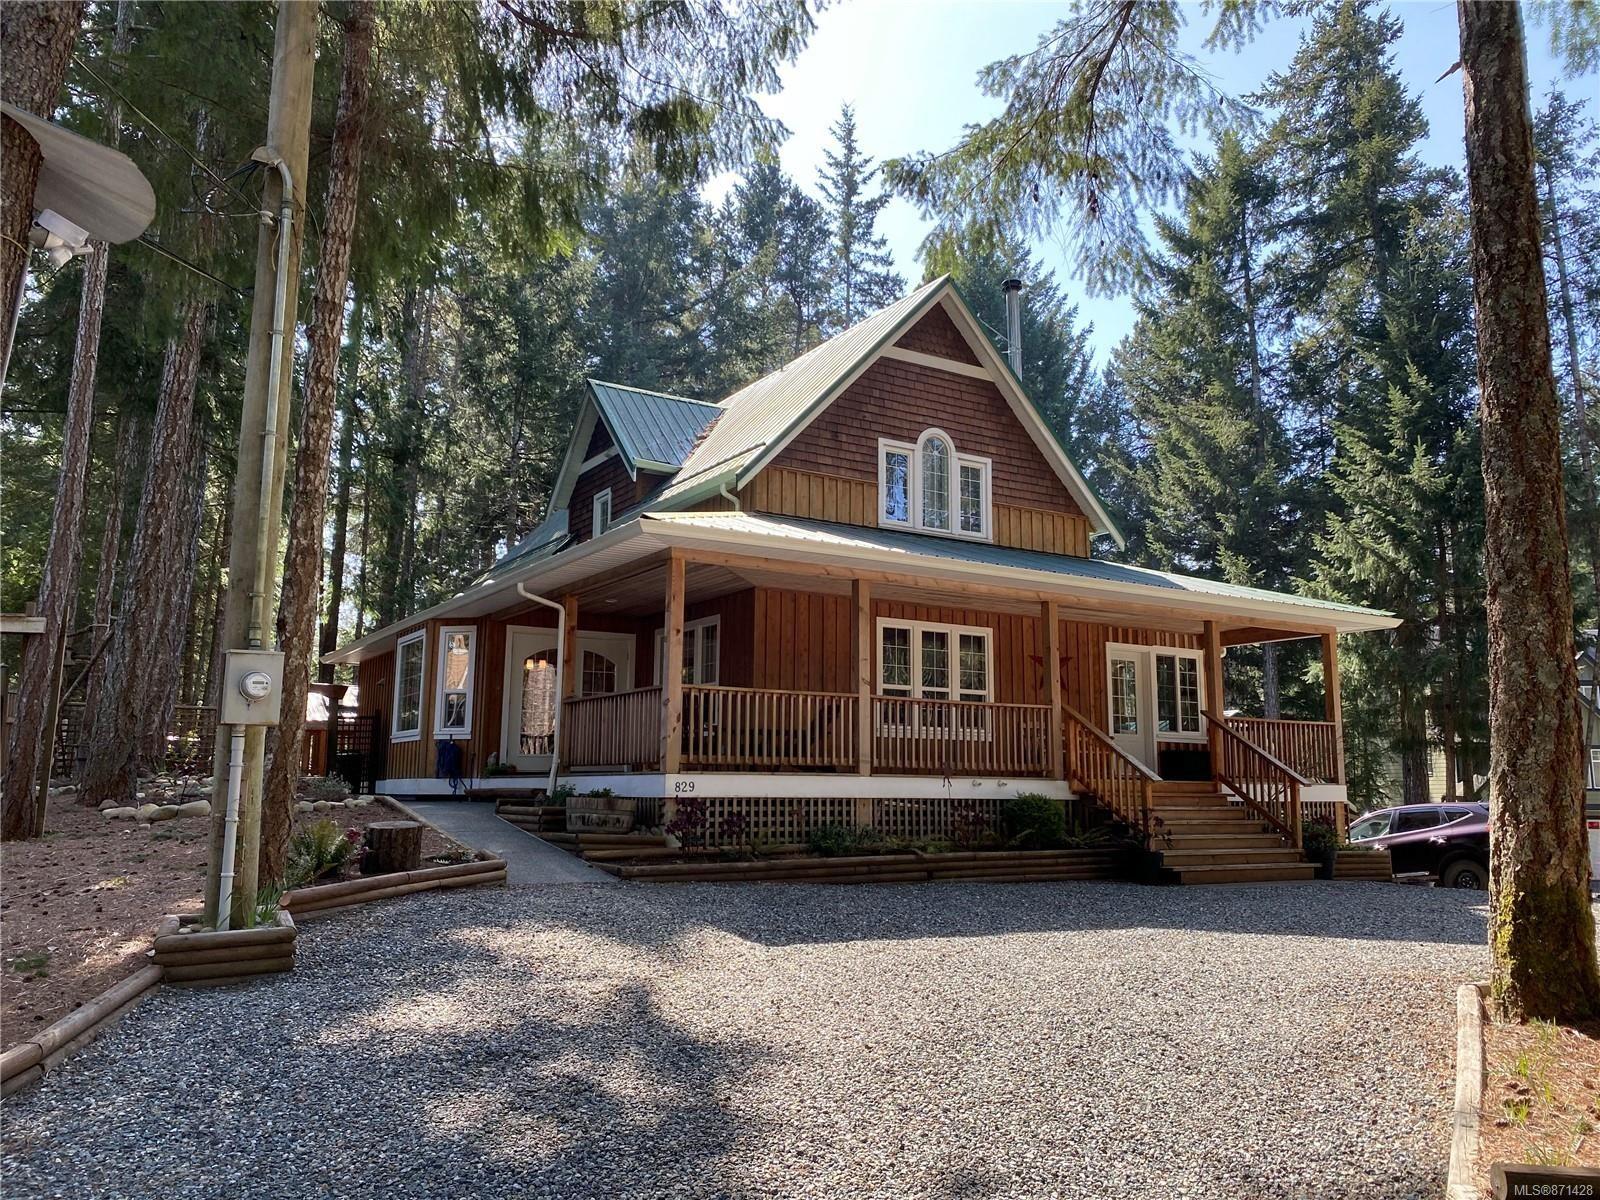 Main Photo: 829 Lazo Rd in : CV Comox Peninsula House for sale (Comox Valley)  : MLS®# 871428